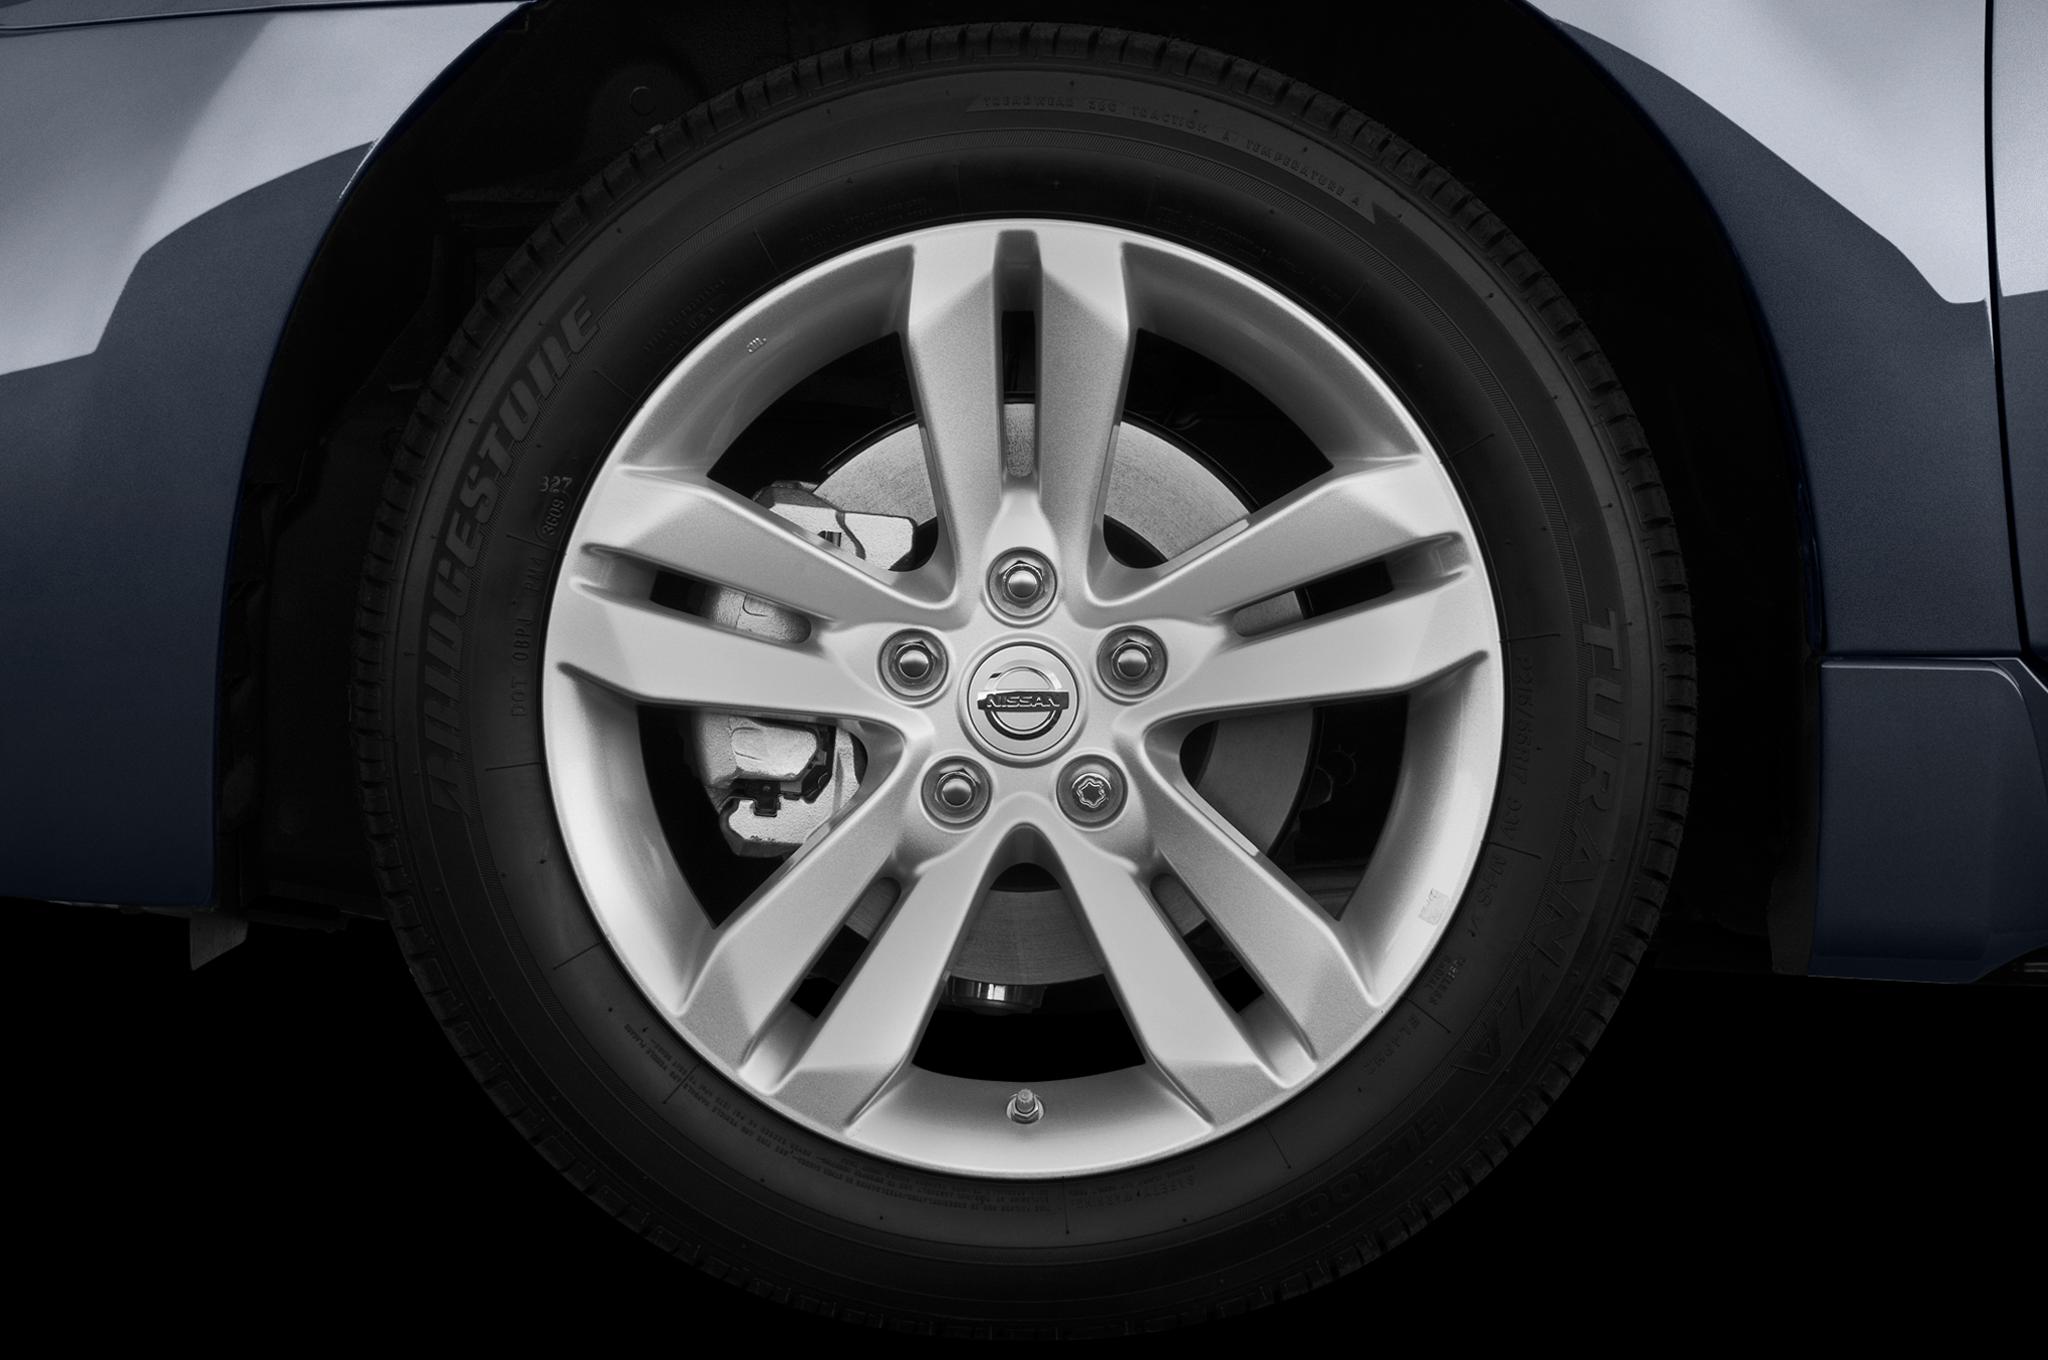 2010 nissan altima coupe 3 5 sr driven automobile magazineNissan Altima Standard Tires #6